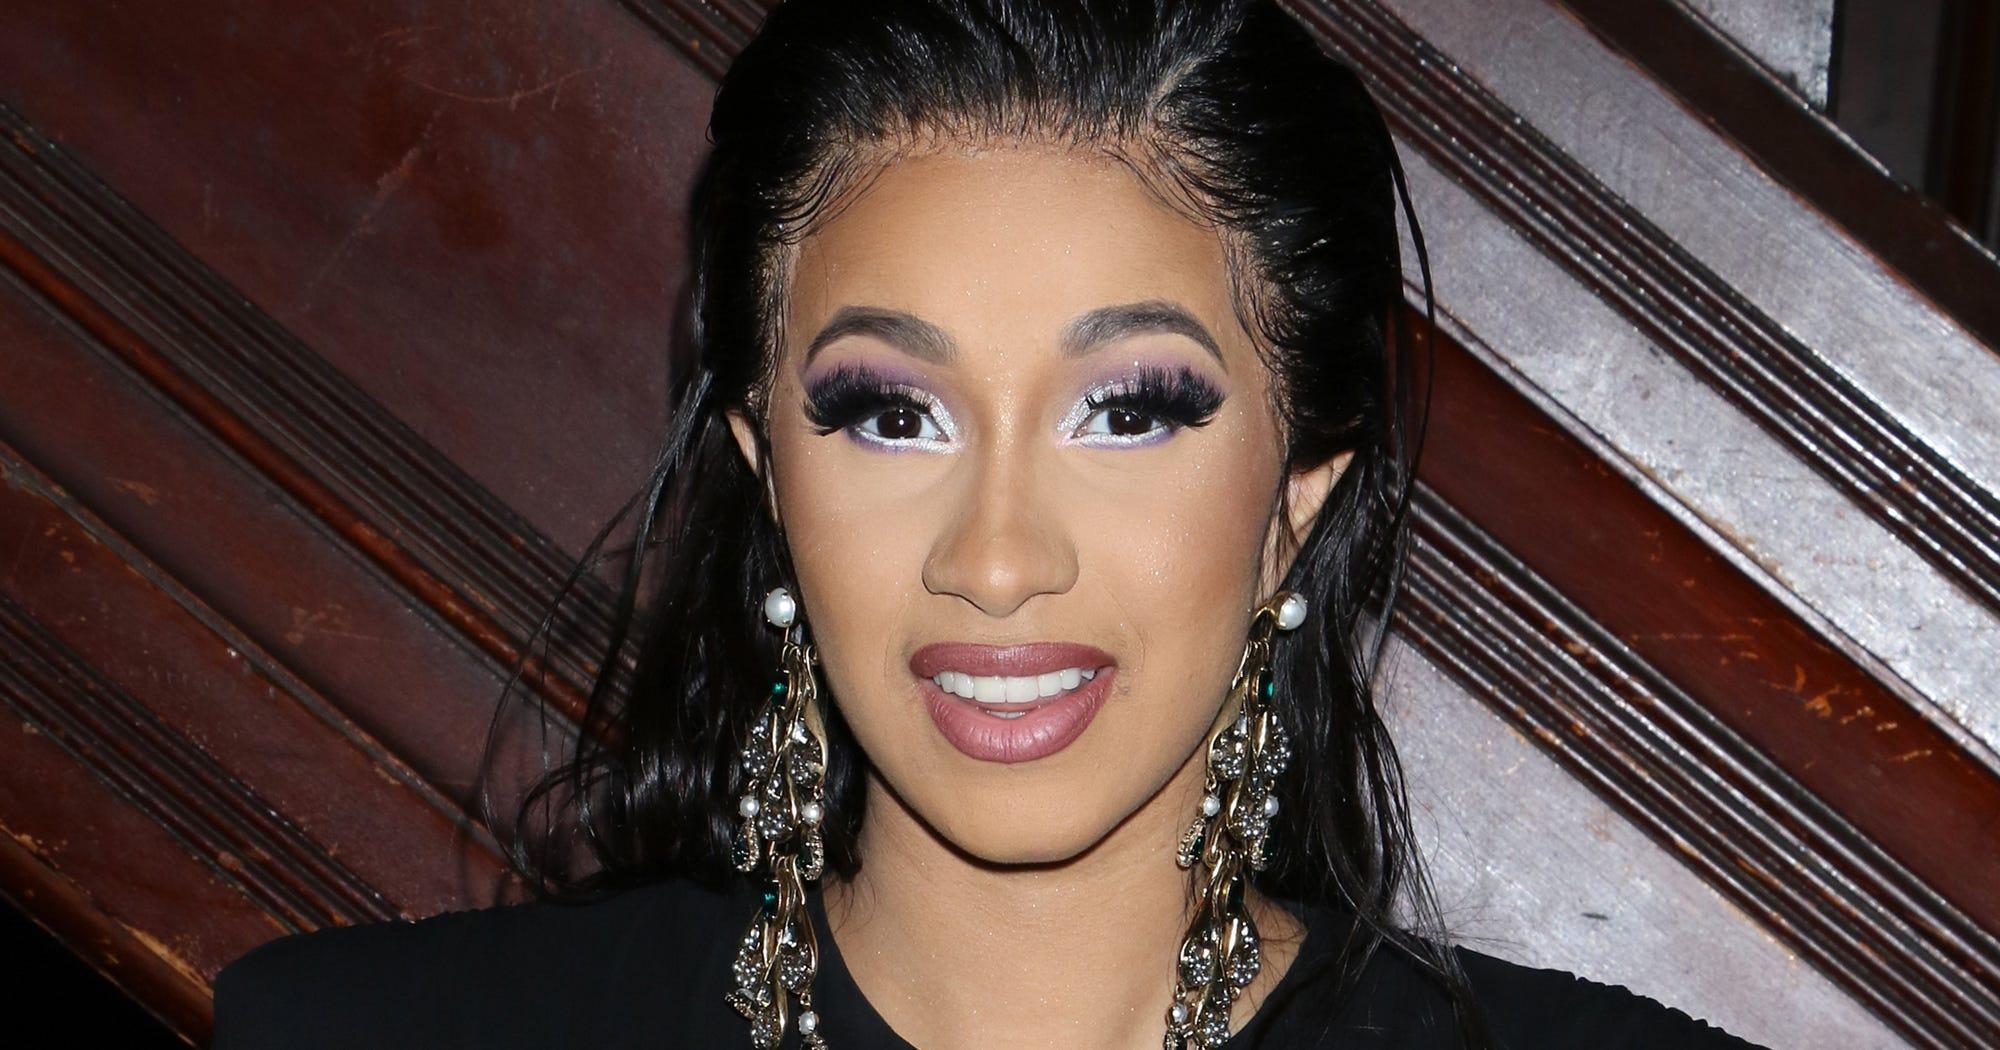 Cardi B Just Endorsed Cynthia Nixon After Nicki Minaj Backed Cuomo